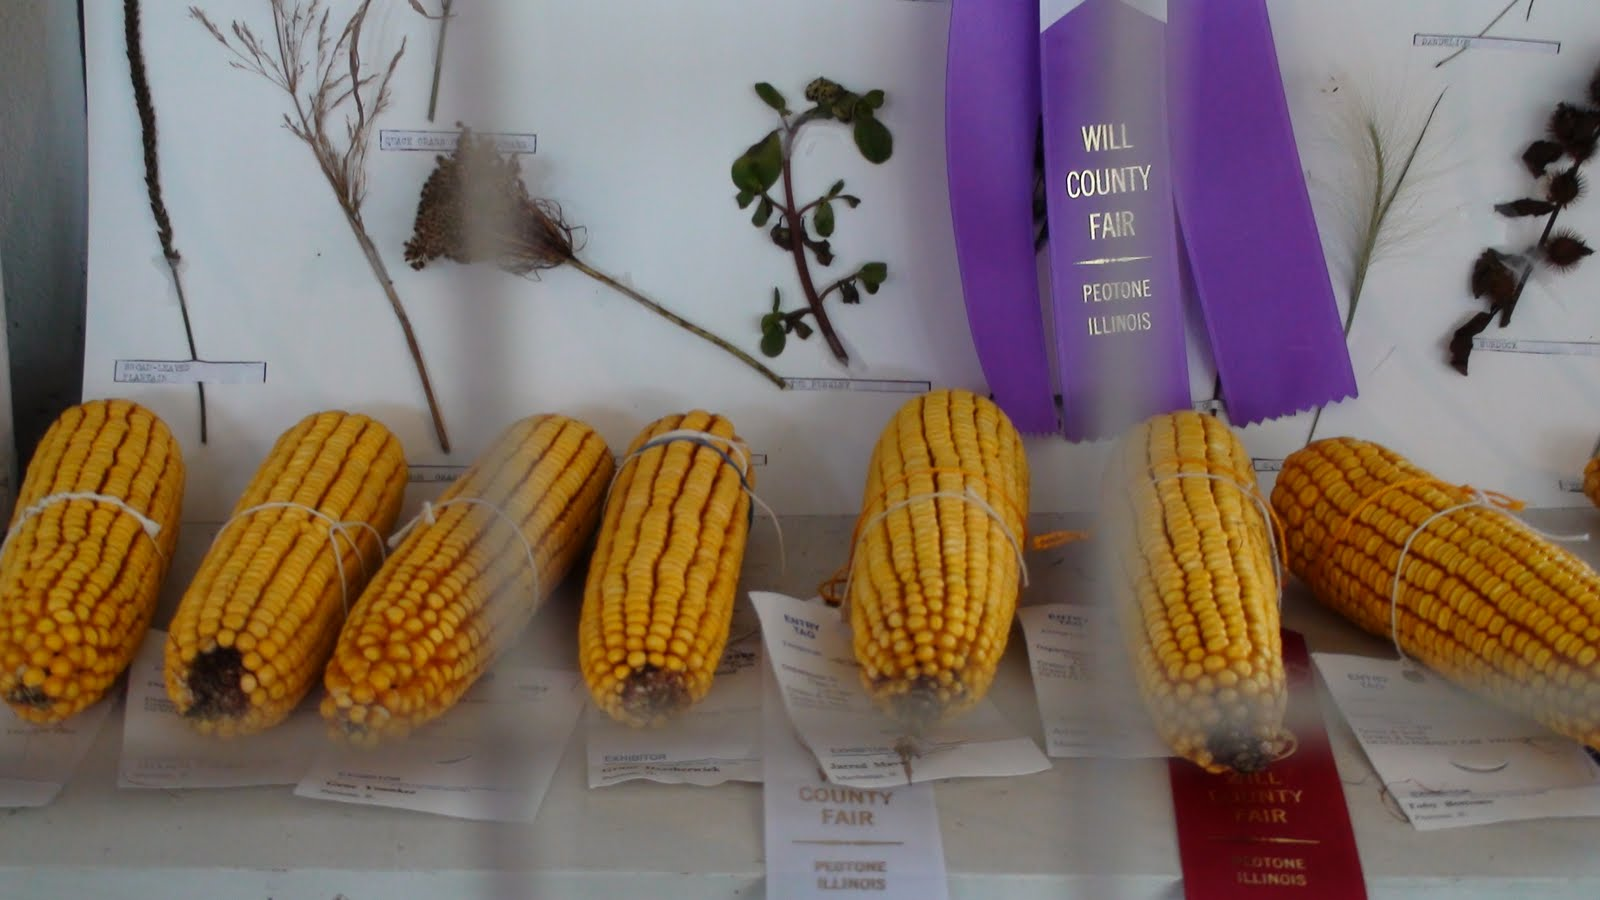 Illinois will county peotone - Award Winning Corn At The Will County Fair In Peotone Illinois